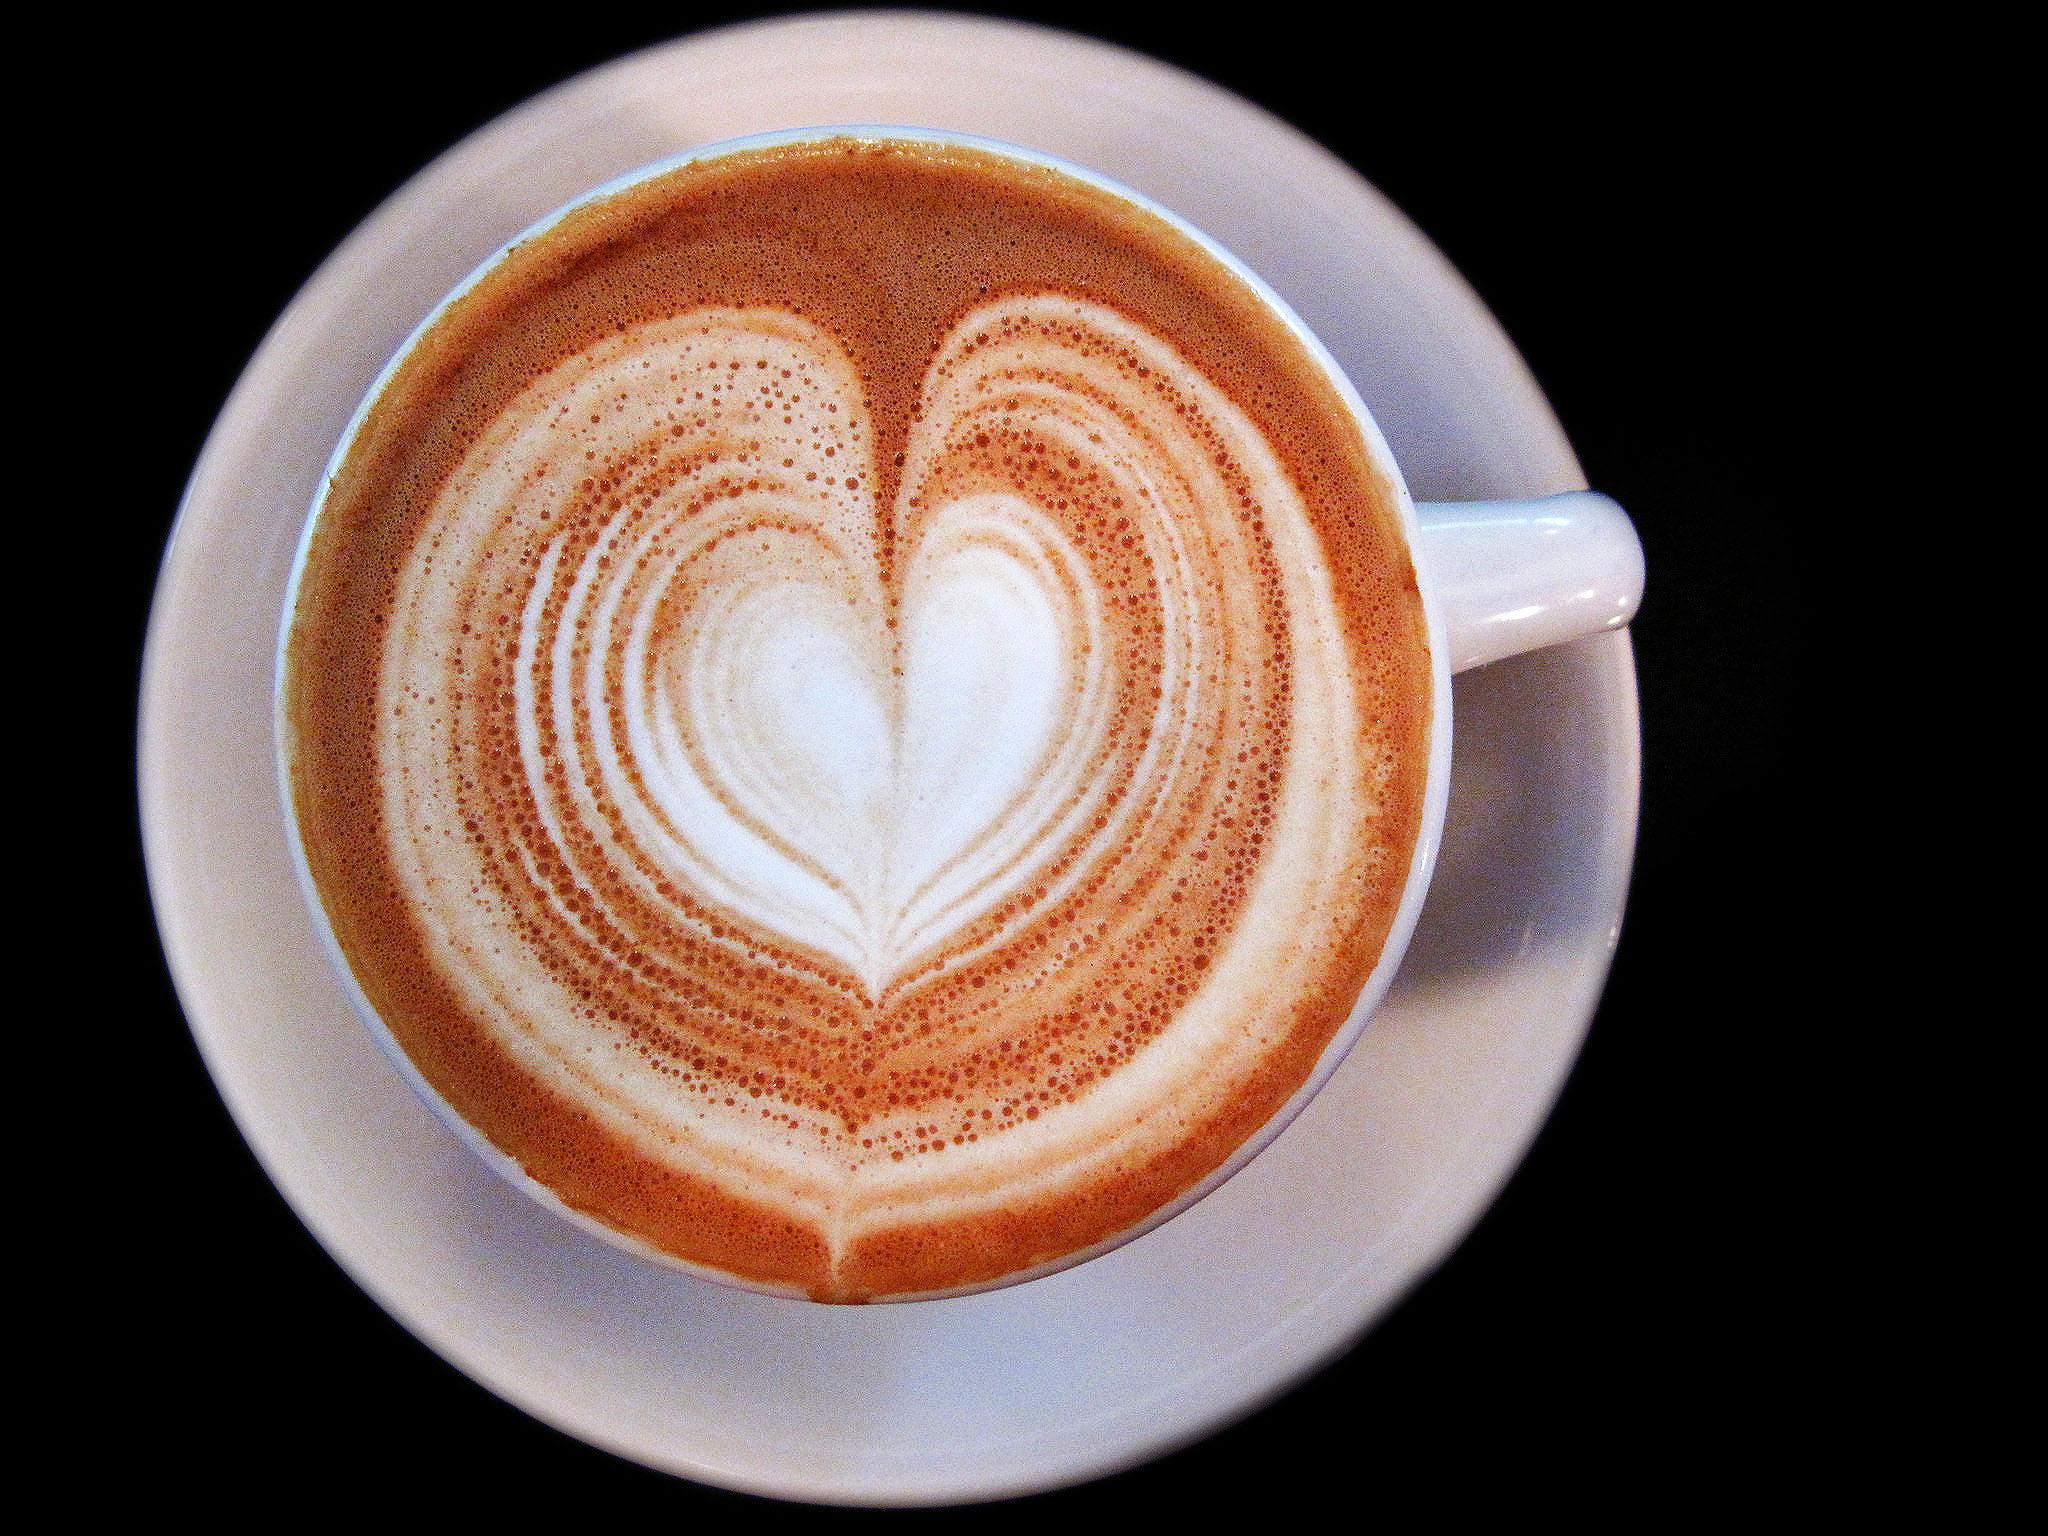 Ninth Street Espresso - Cappuccino 2